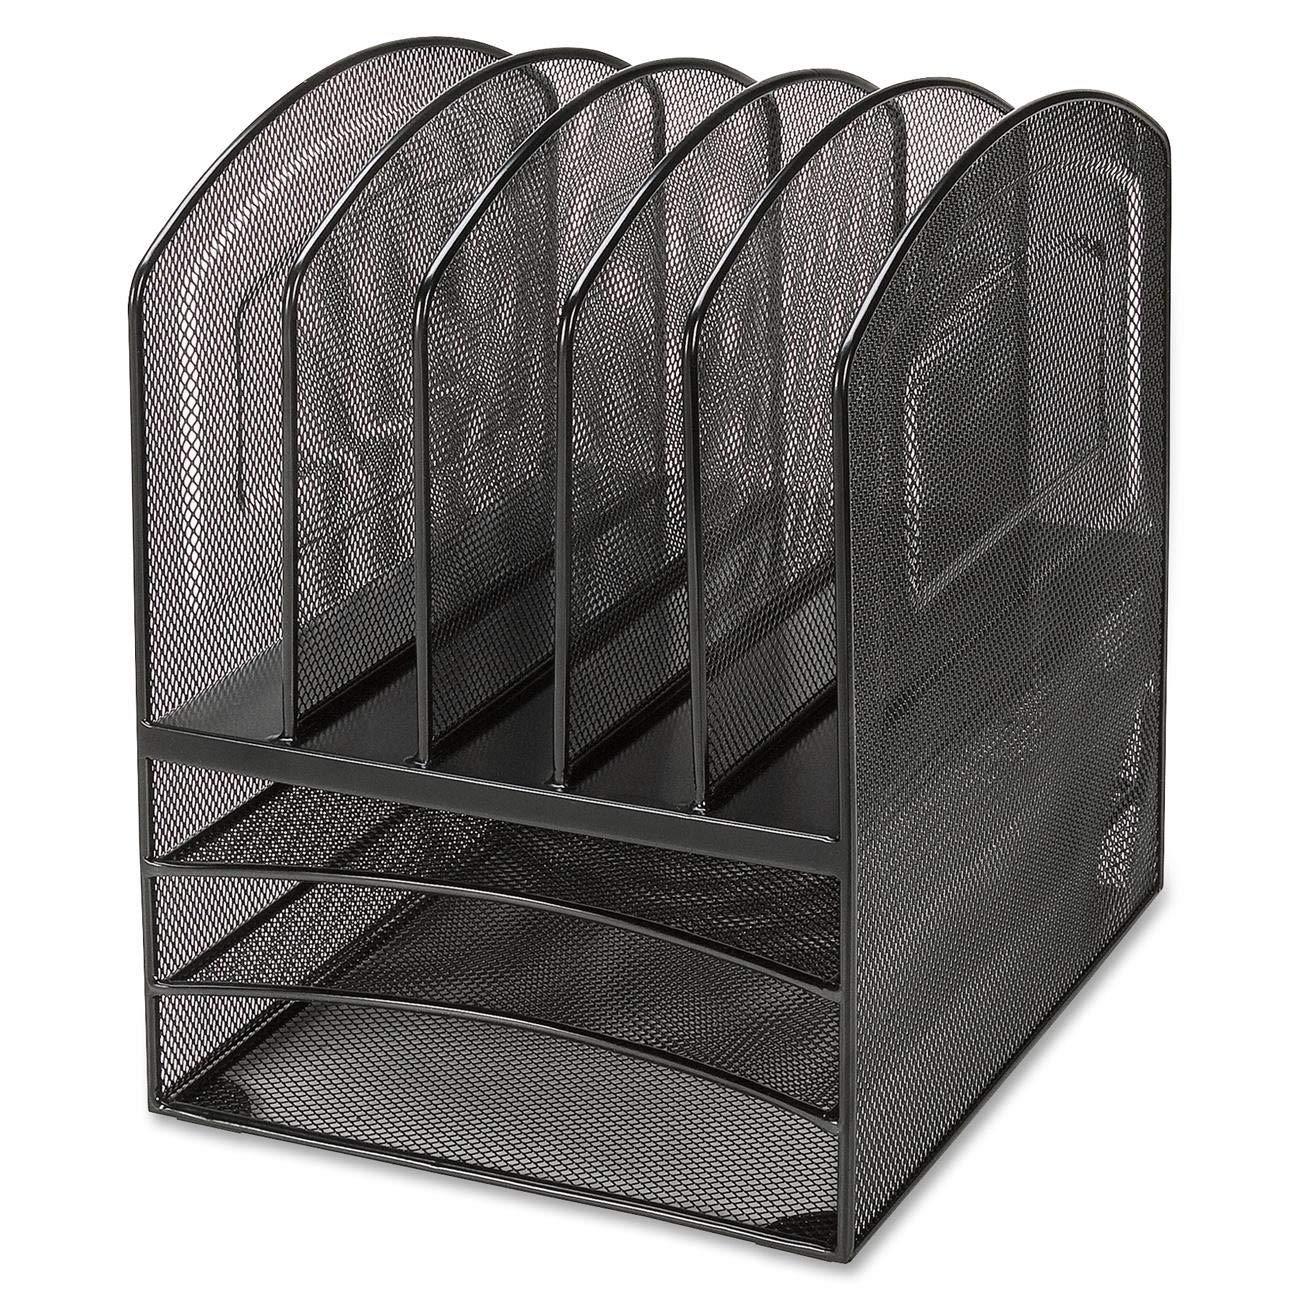 Lorell LLR95255 Mesh Horizontal Vertical Desktop Organizer